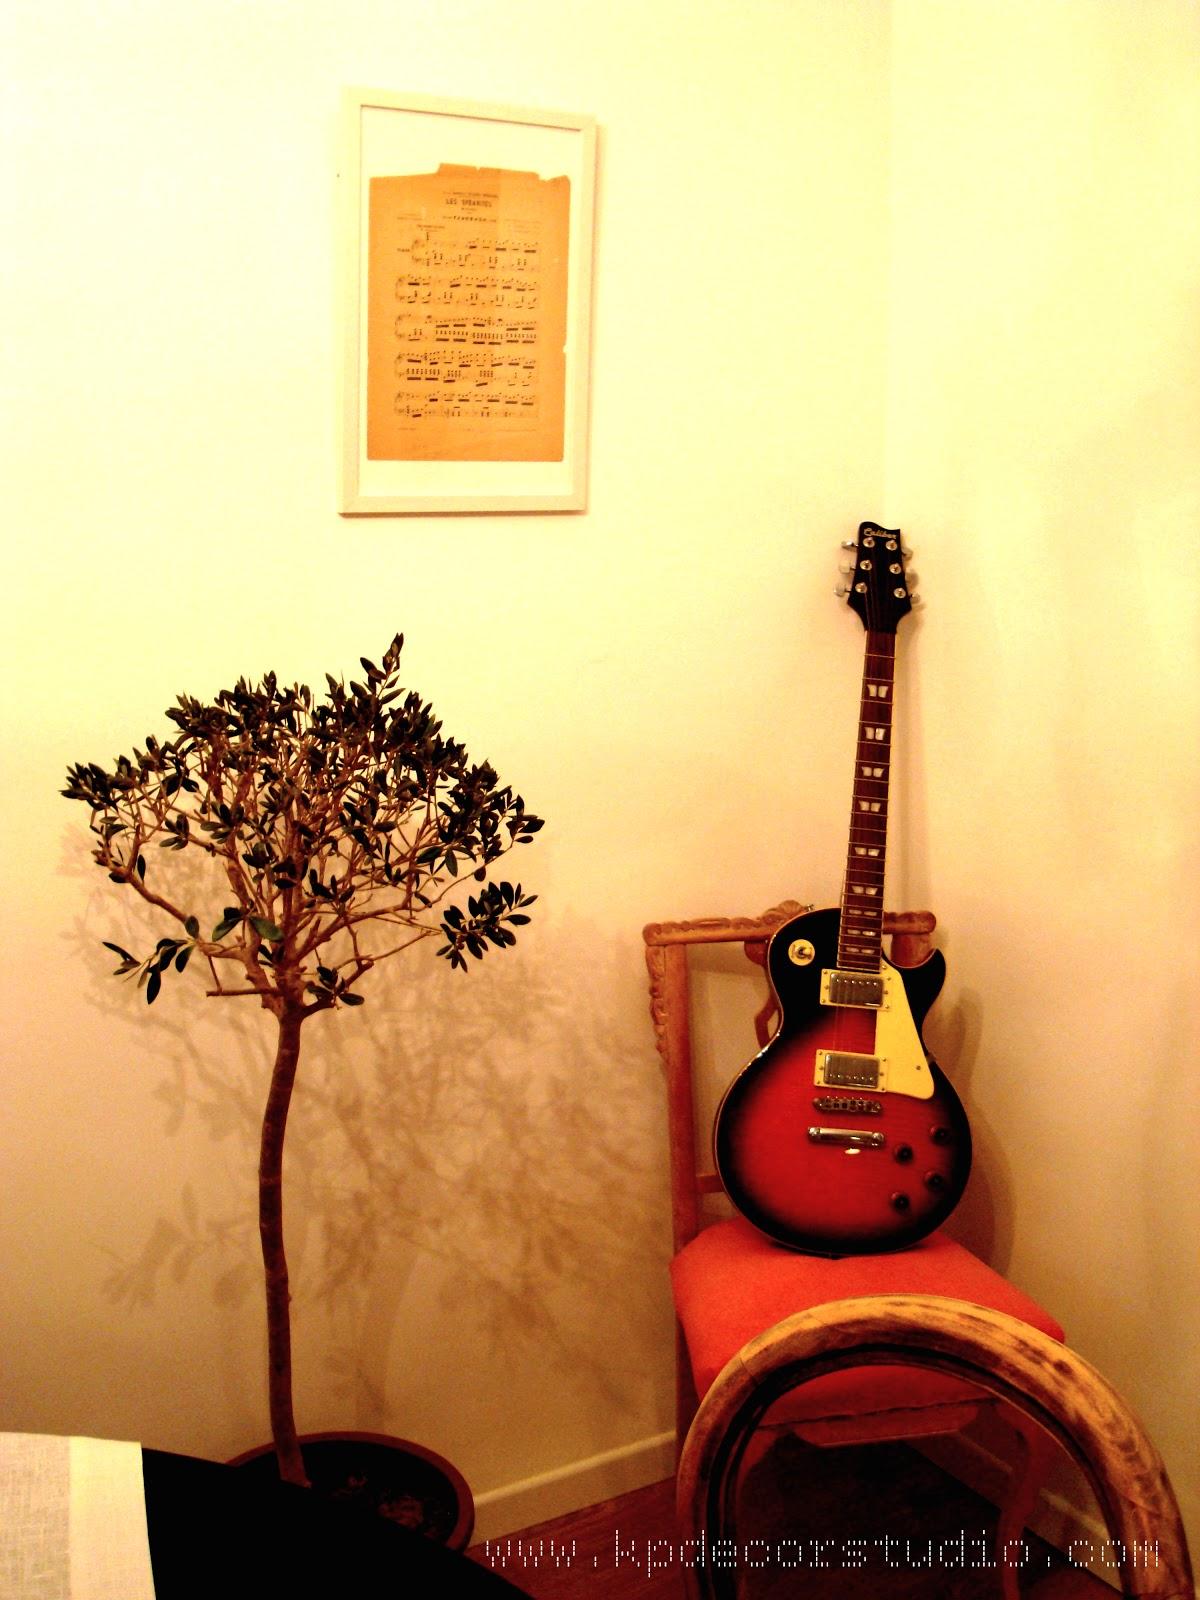 Objetos decoracion baratos fabulous reciclar objetos - Decoracion casa barato ...